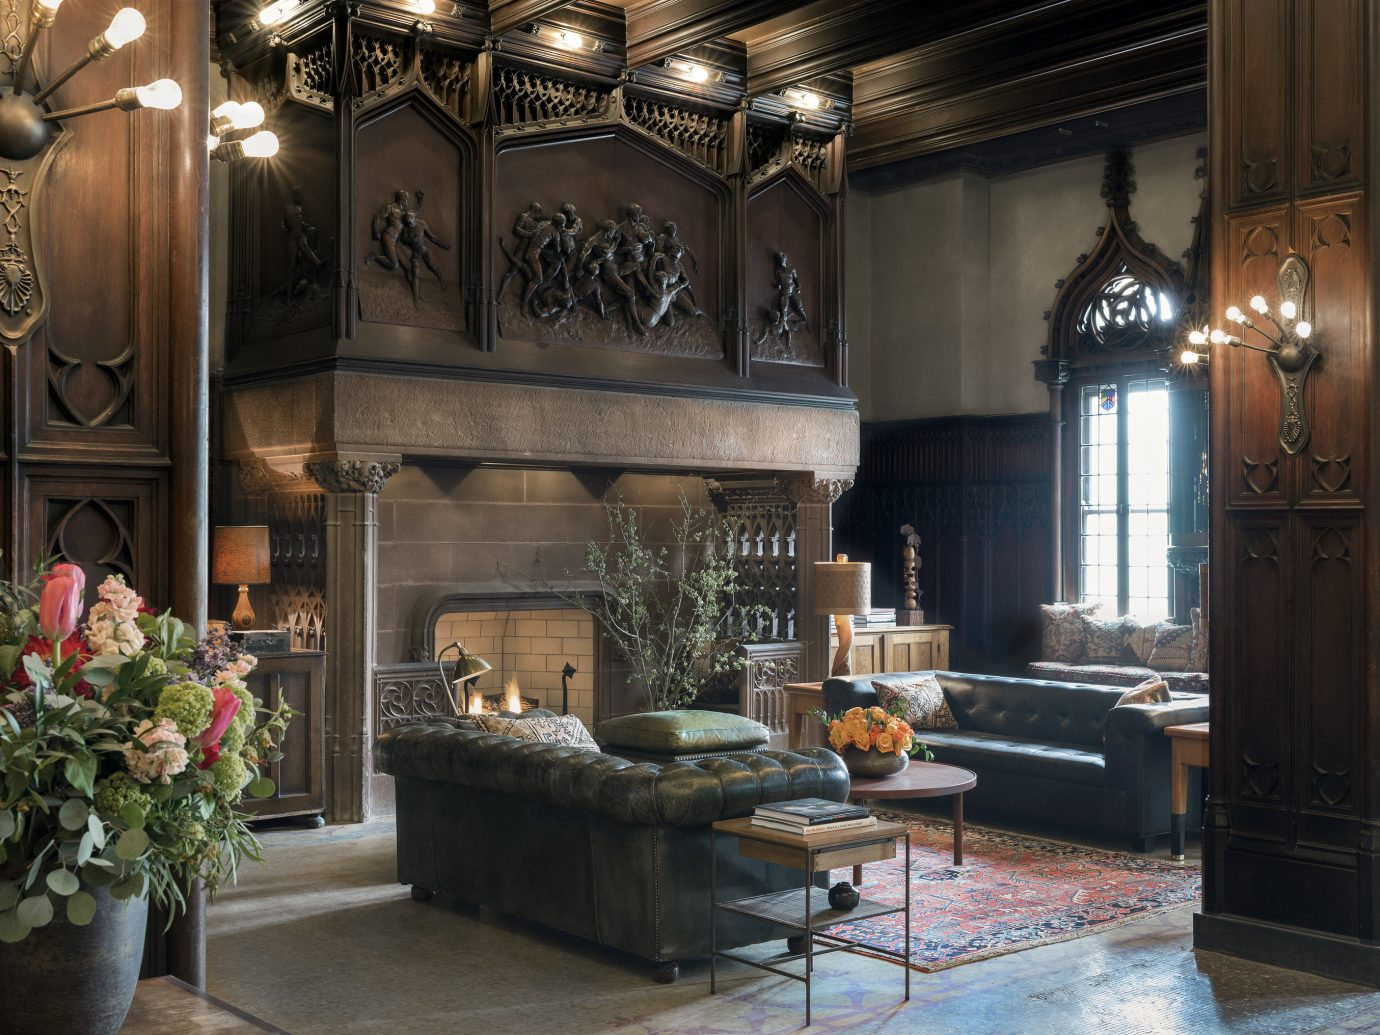 Trip Ideas indoor room flower estate interior design home living room Lobby altar mansion furniture decorated stone